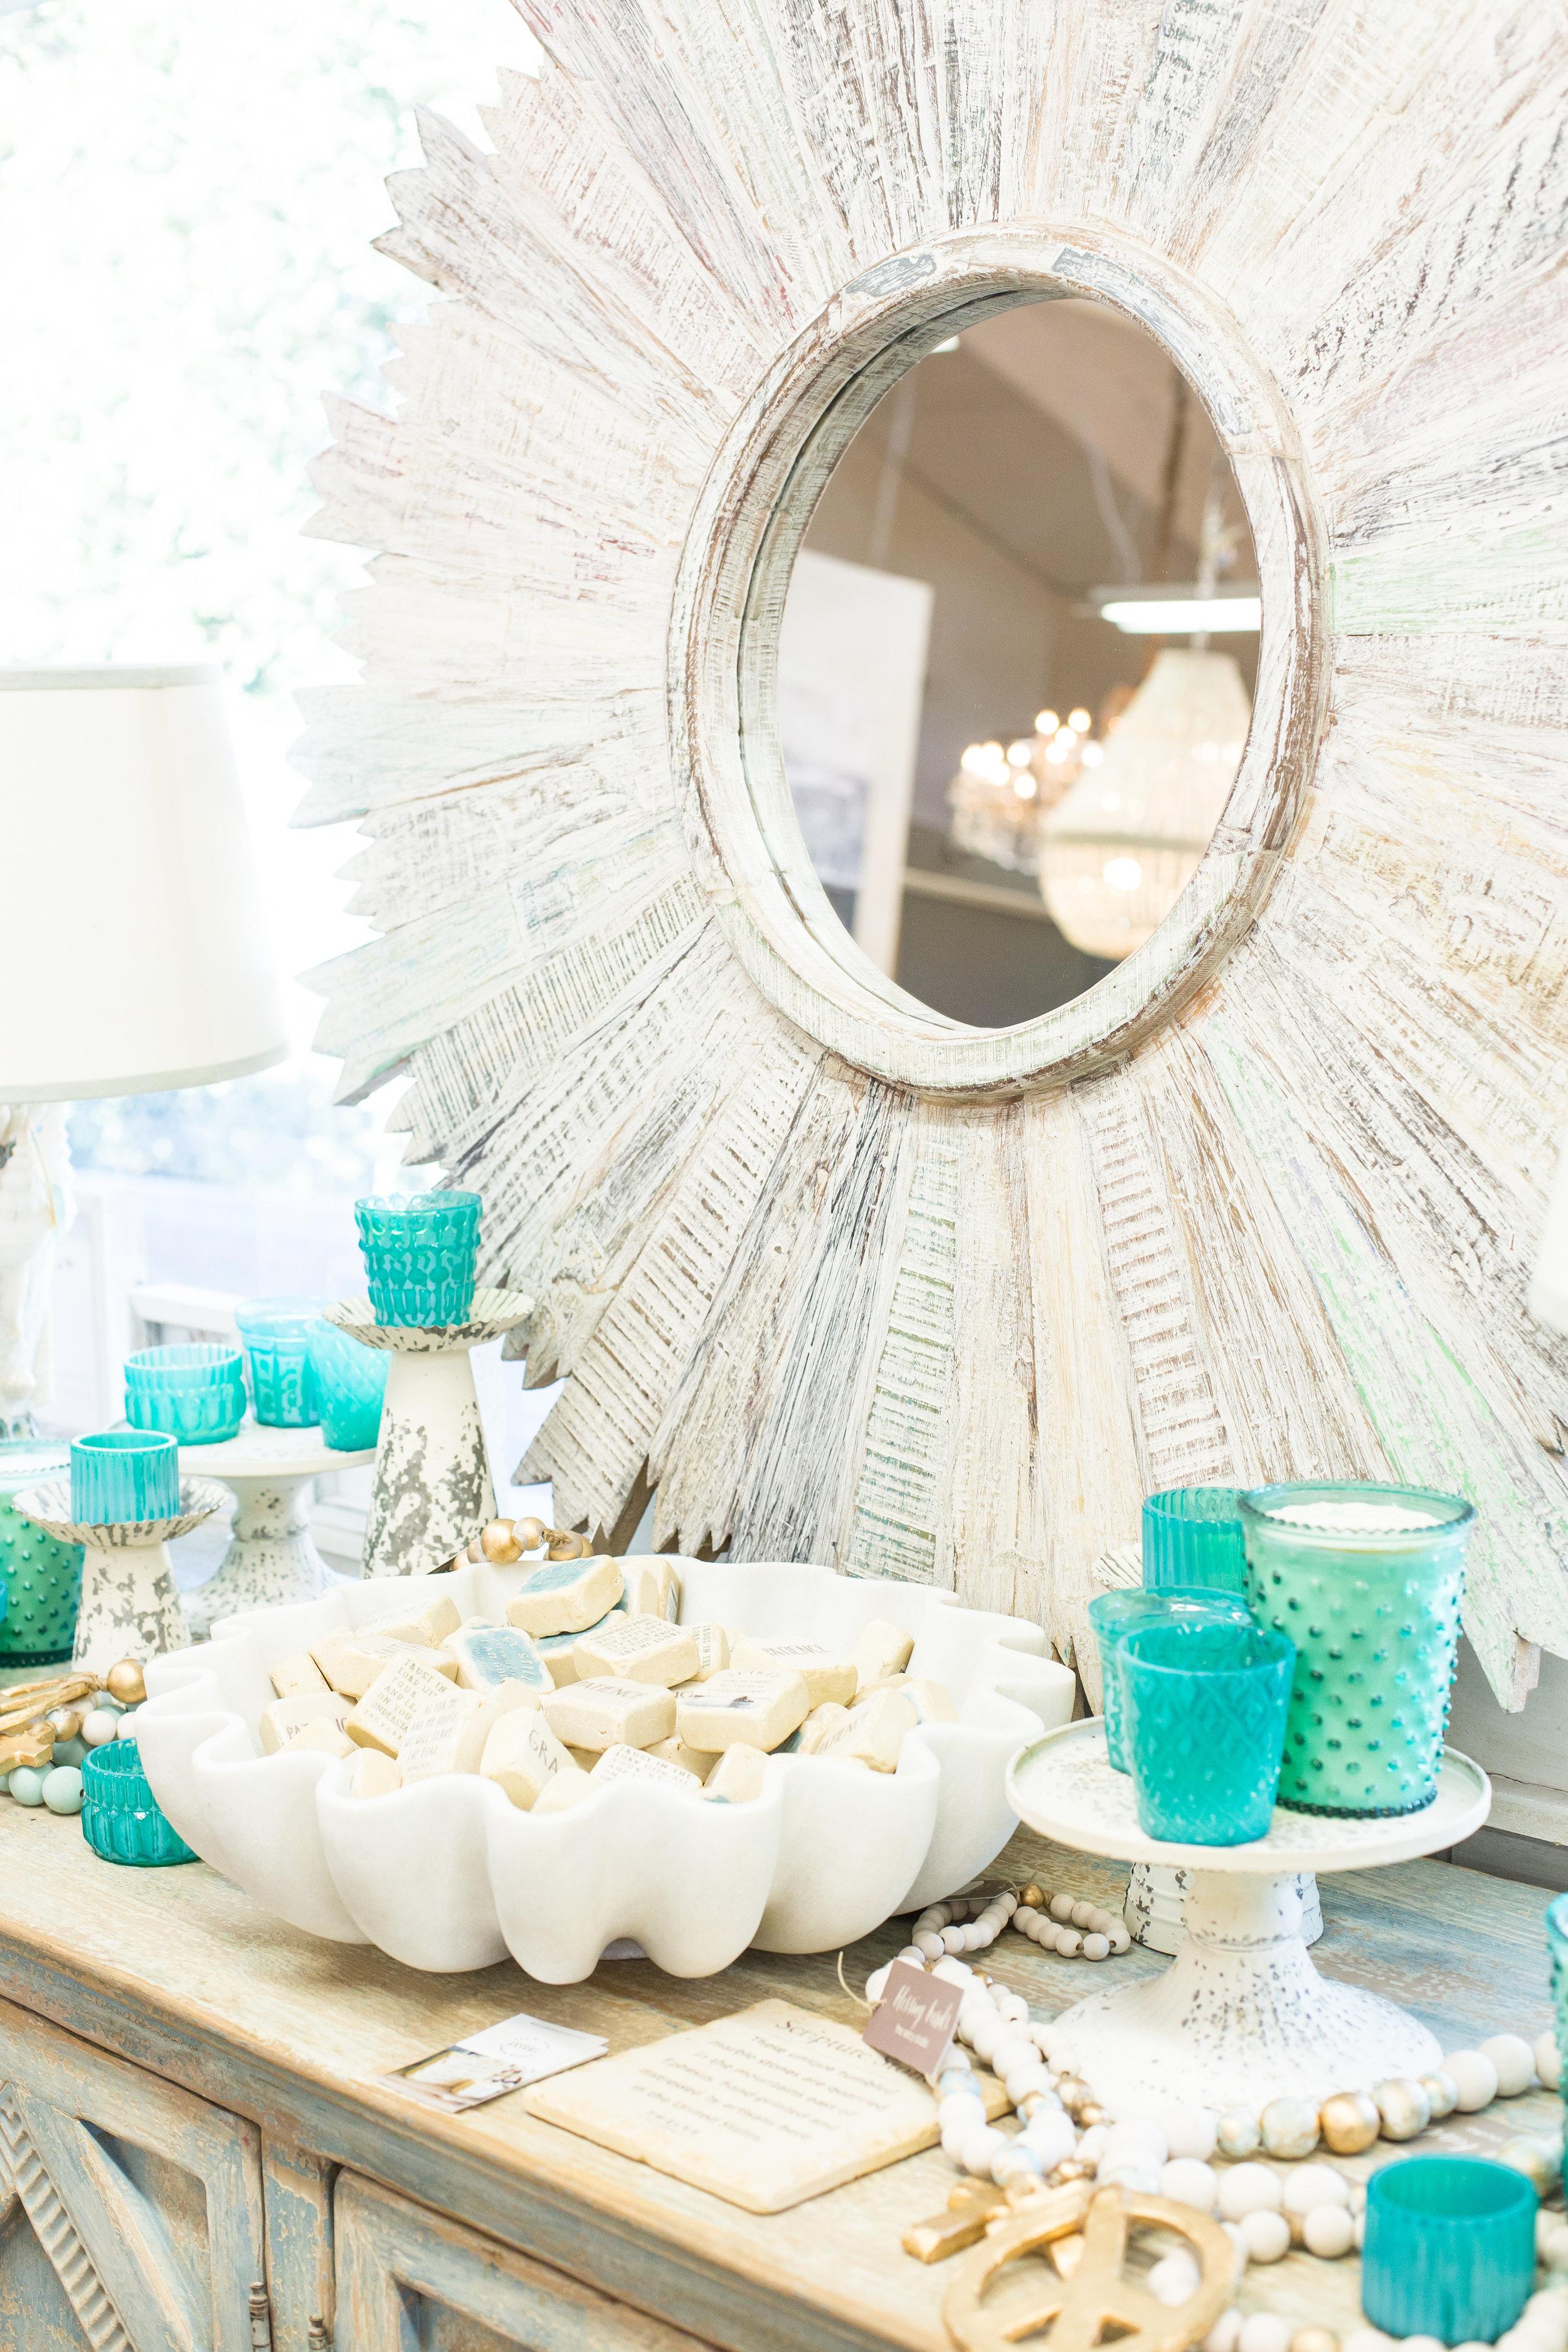 White sunburst mirror, candles, decor